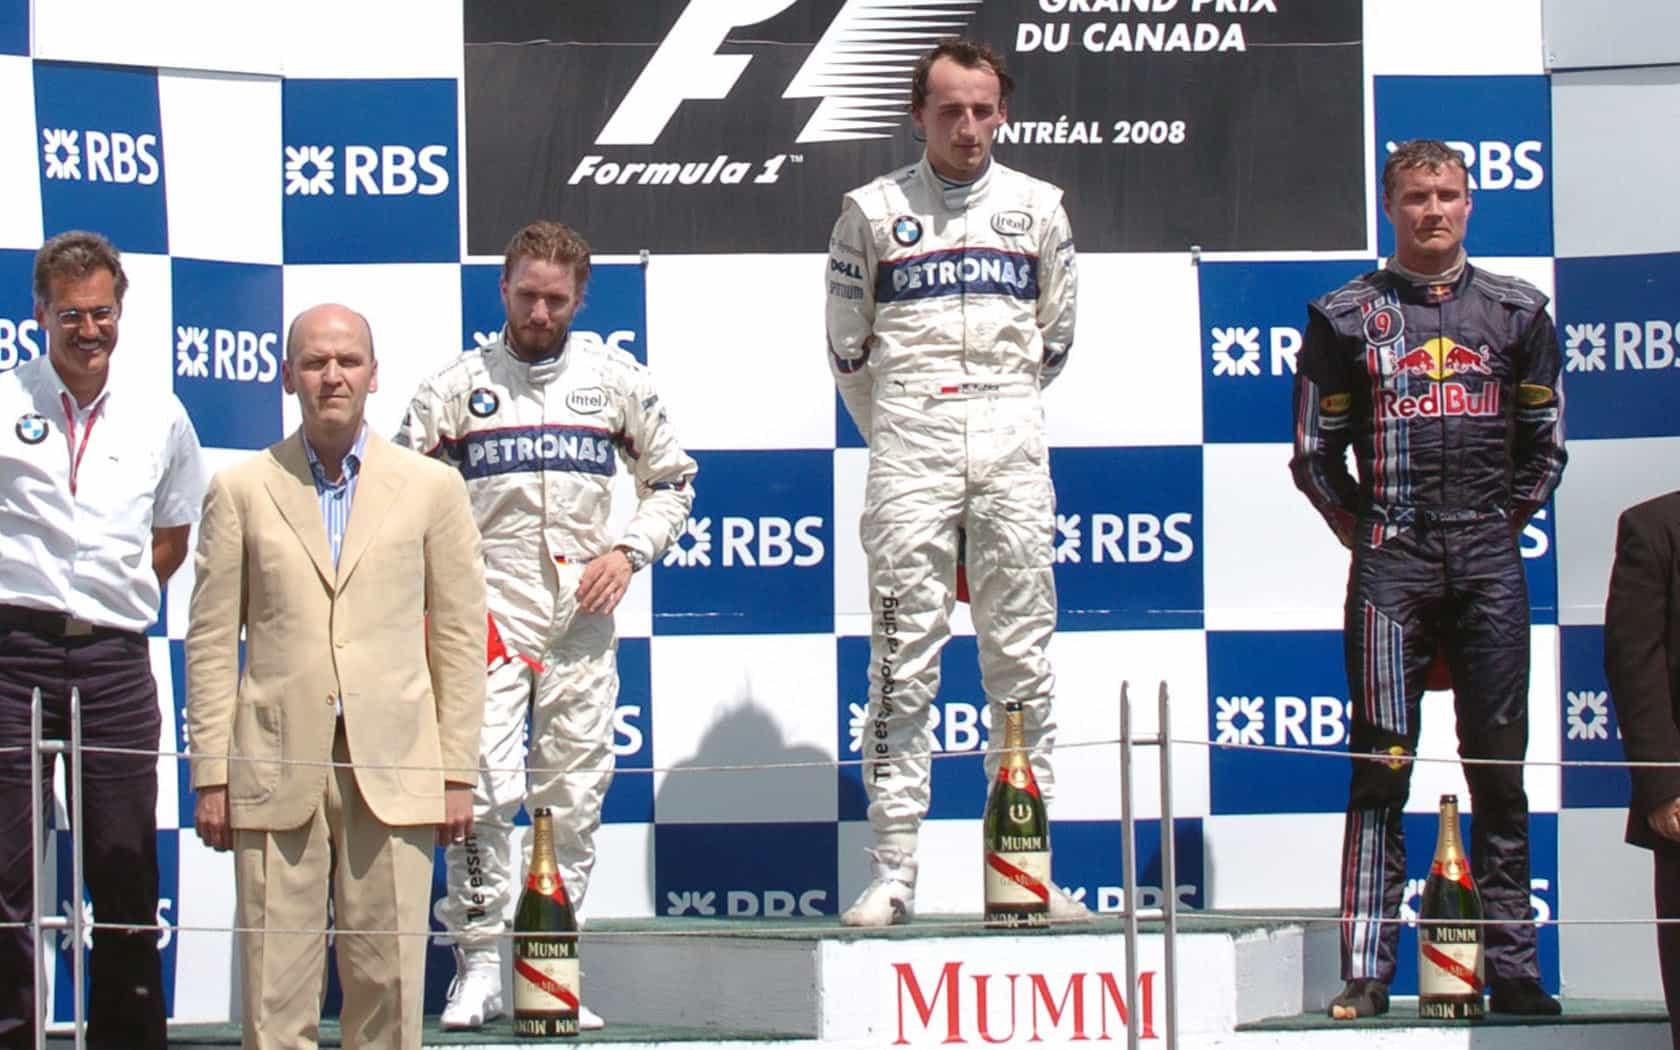 https://maxf1.net/wp-content/uploads/2017/06/Canada-F1-2008-podium-Kubica-Heidfeld-COulthard-Foto-F1fansite.jpg